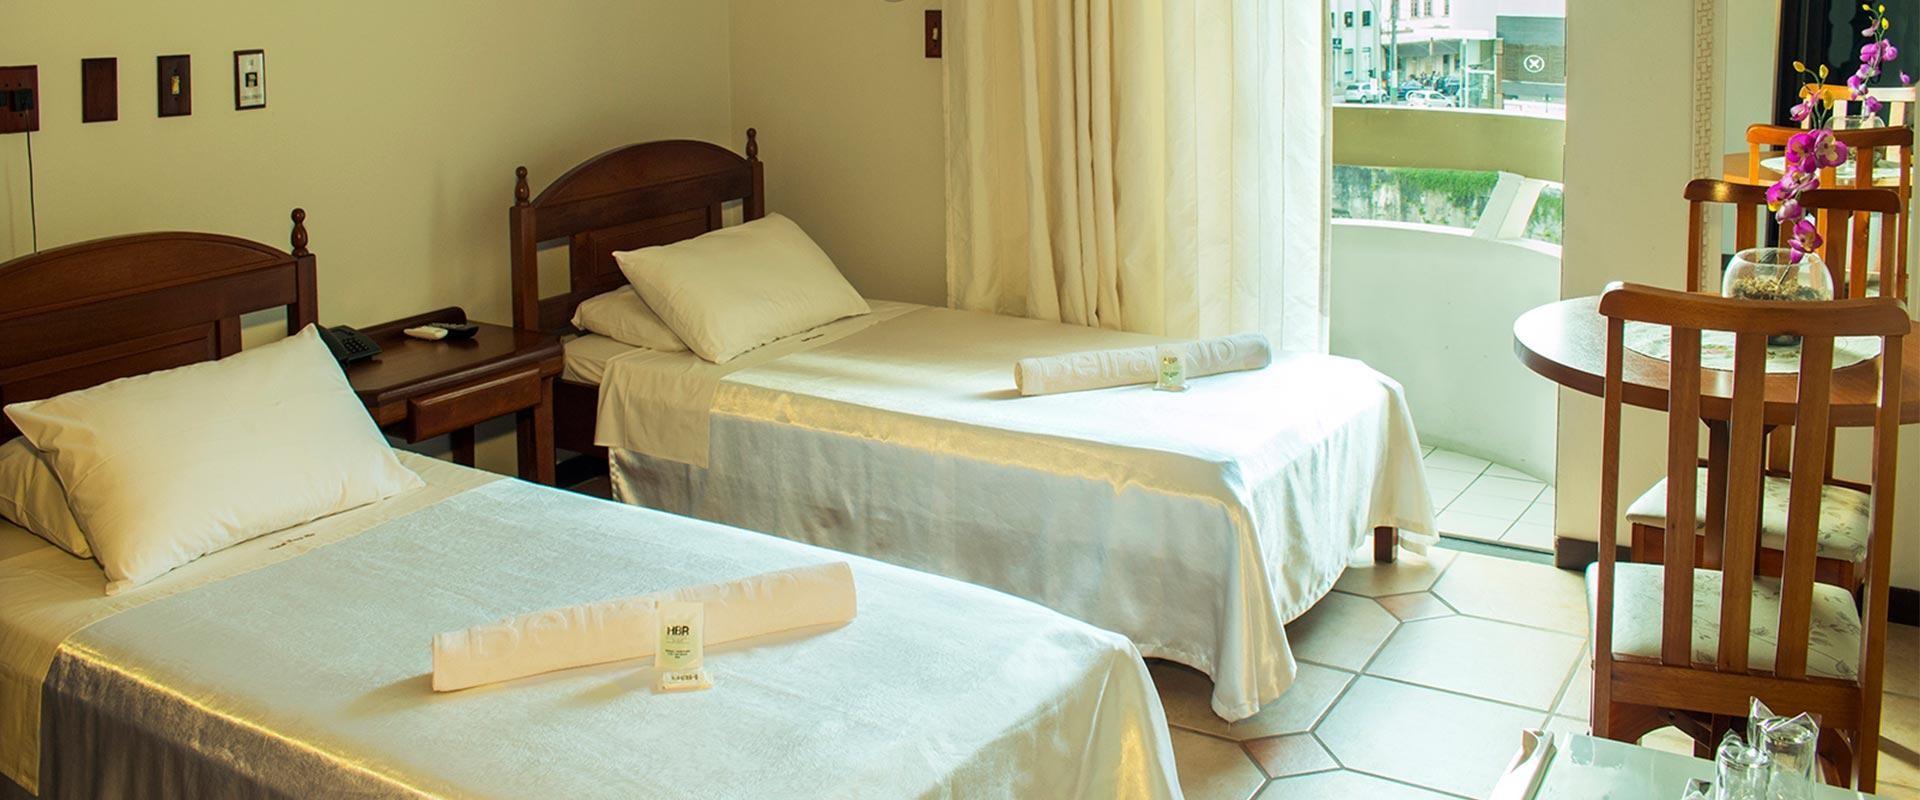 hotel-brusque-quarto-duplo-twin1